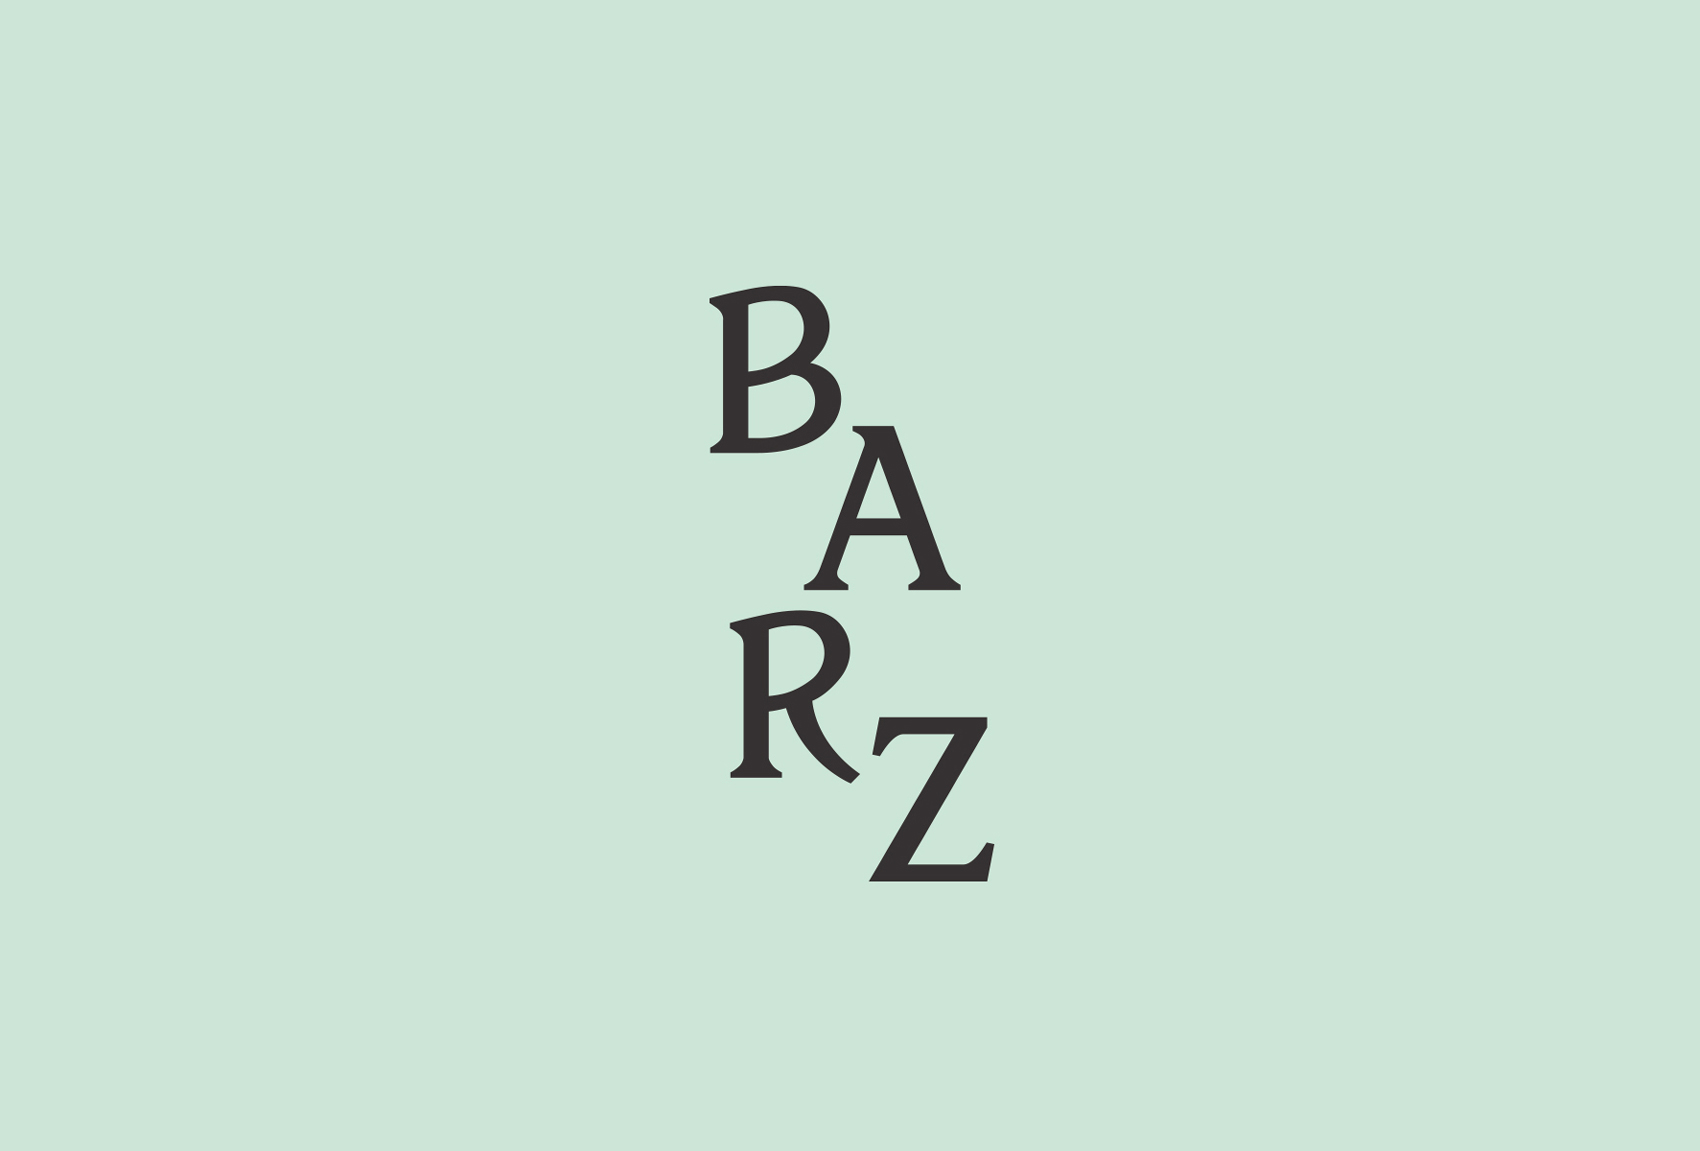 Barz – Visual Journal